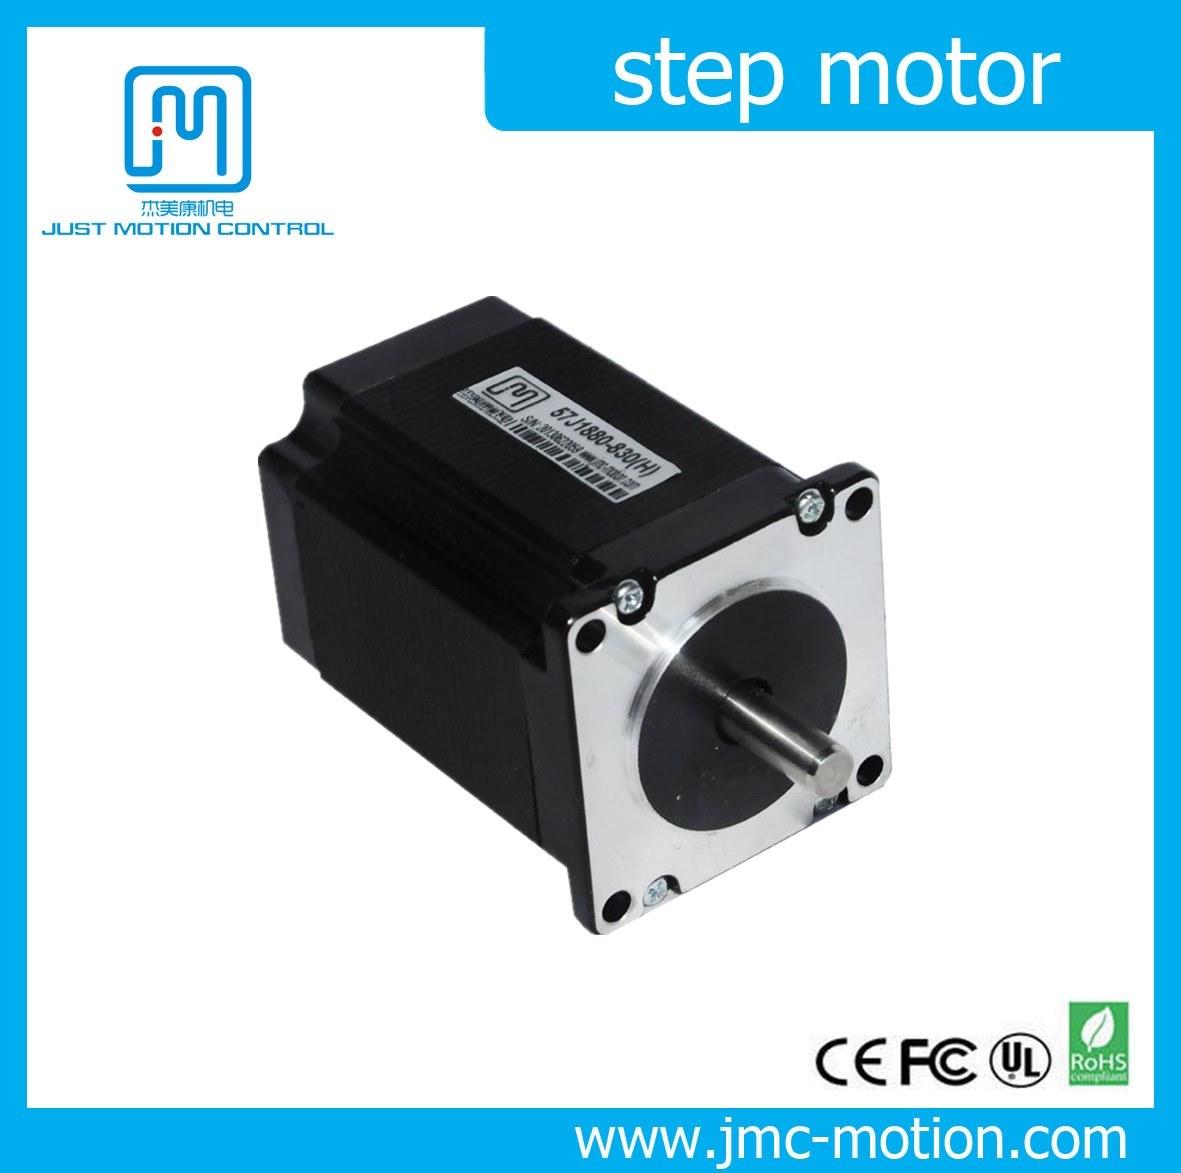 CNC 2 Phase NEMA 23 Stepping Motor 1.8degree CE RoHS Certification